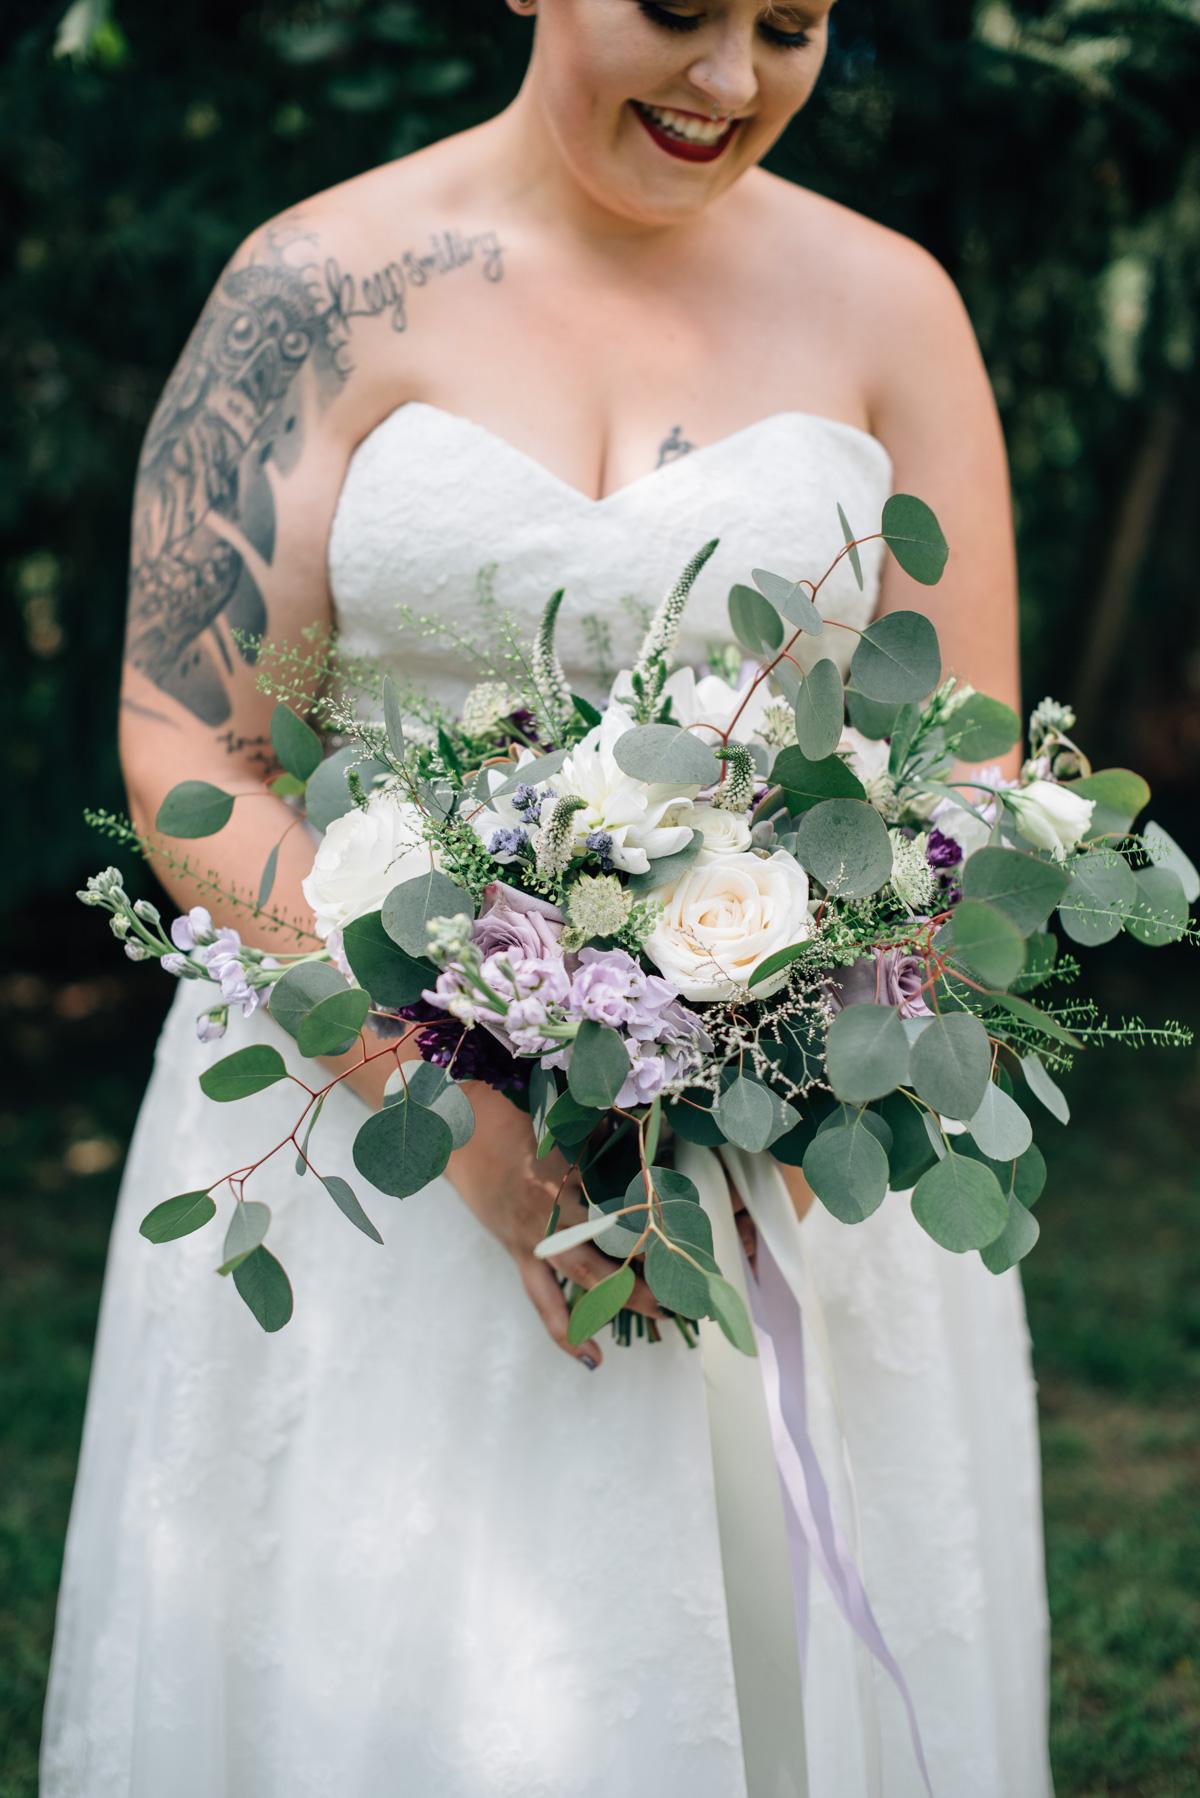 sara-wilde-photography-vineyard-bride-swish-list-beamer-falls-manor-grimsby-wedding-43.jpg